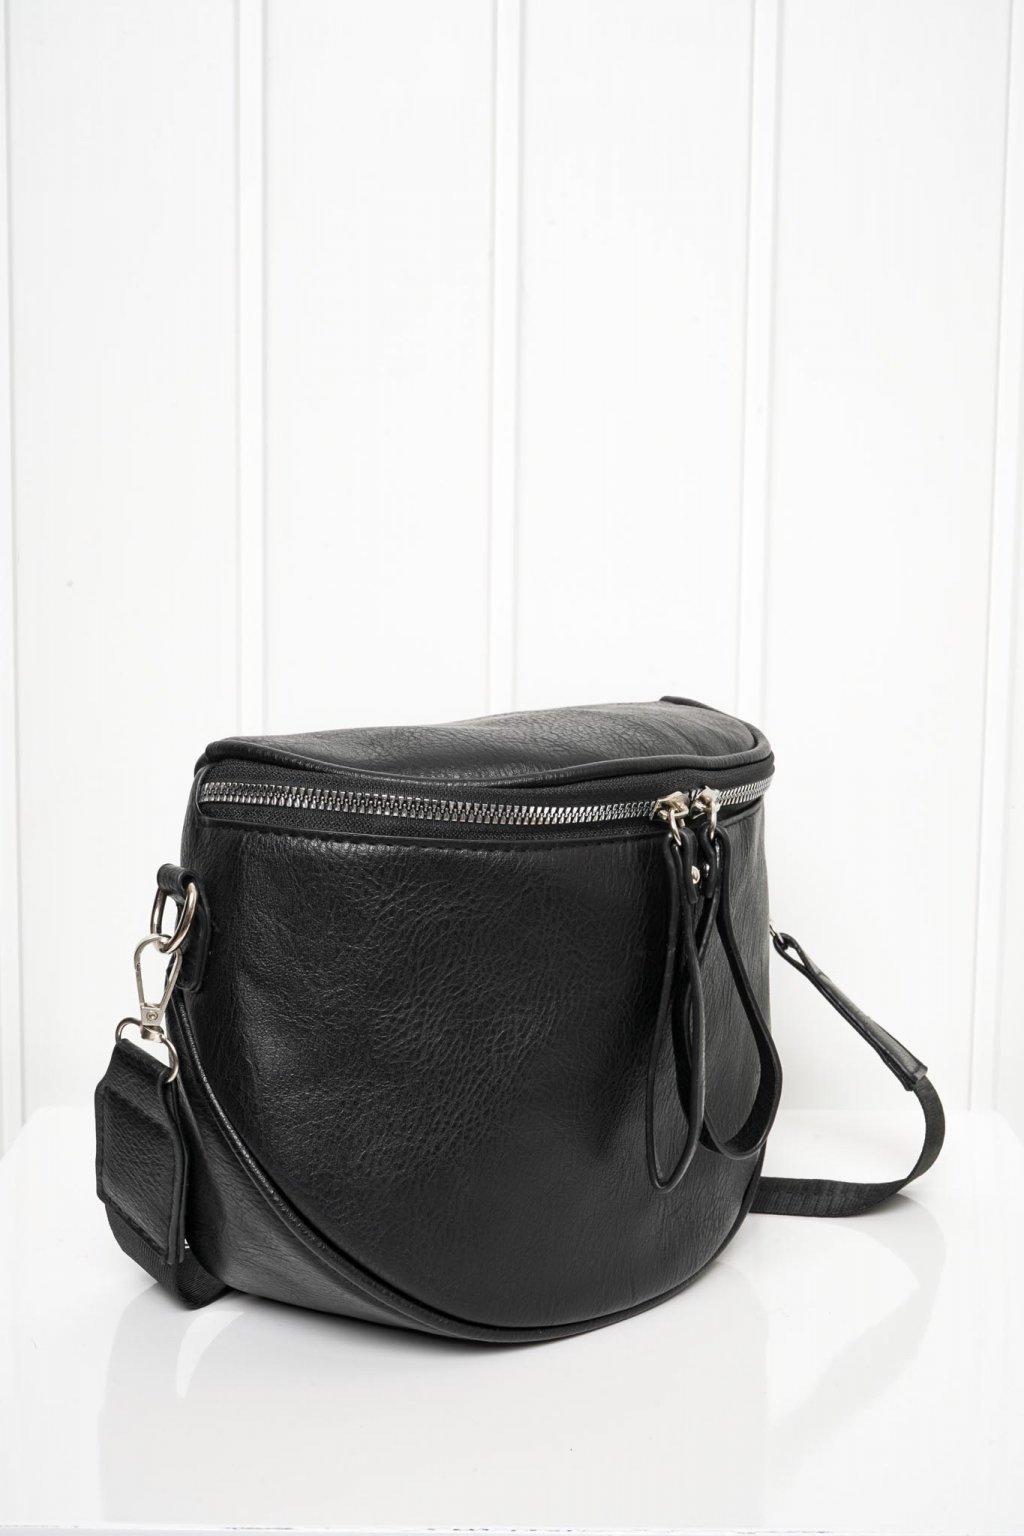 Kabelka, crossbody, ruksak, shopping bag, shopperka, 232